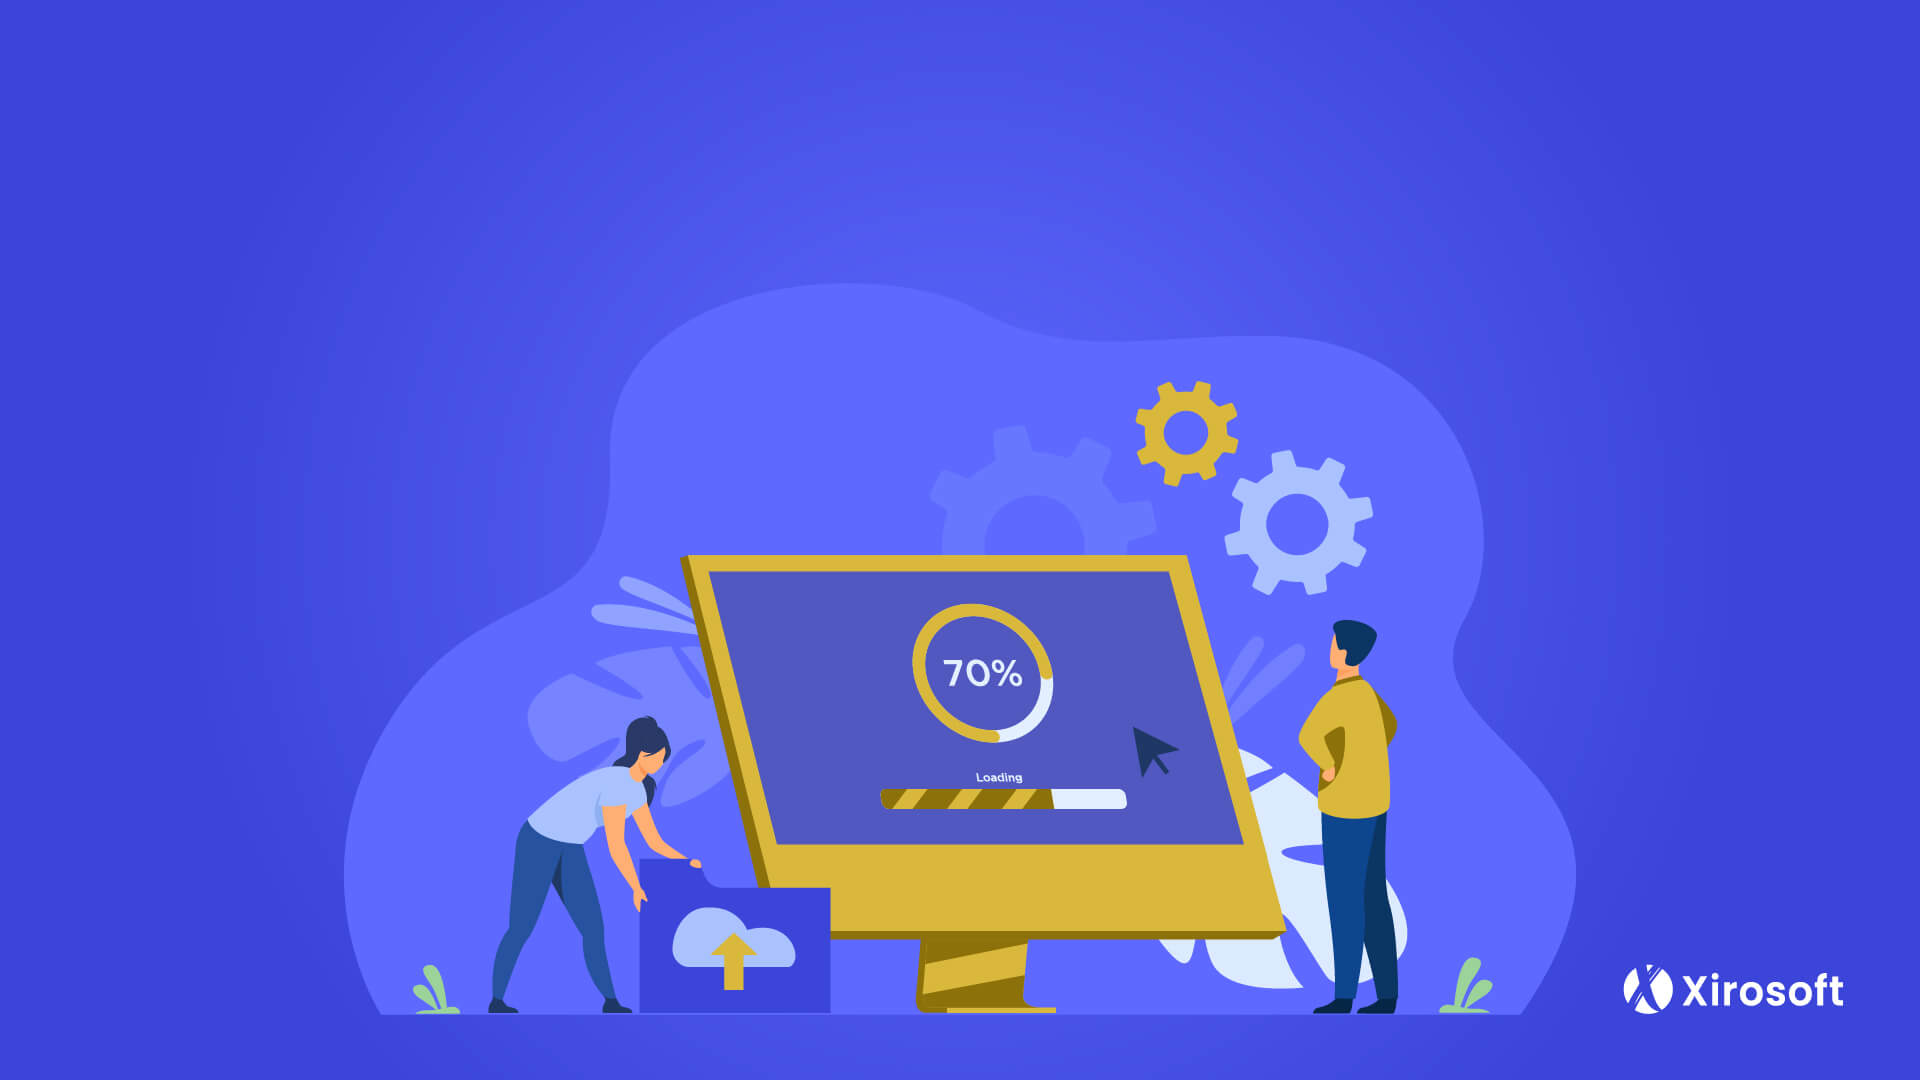 How to Improve Web Design Skills: Quick Tips